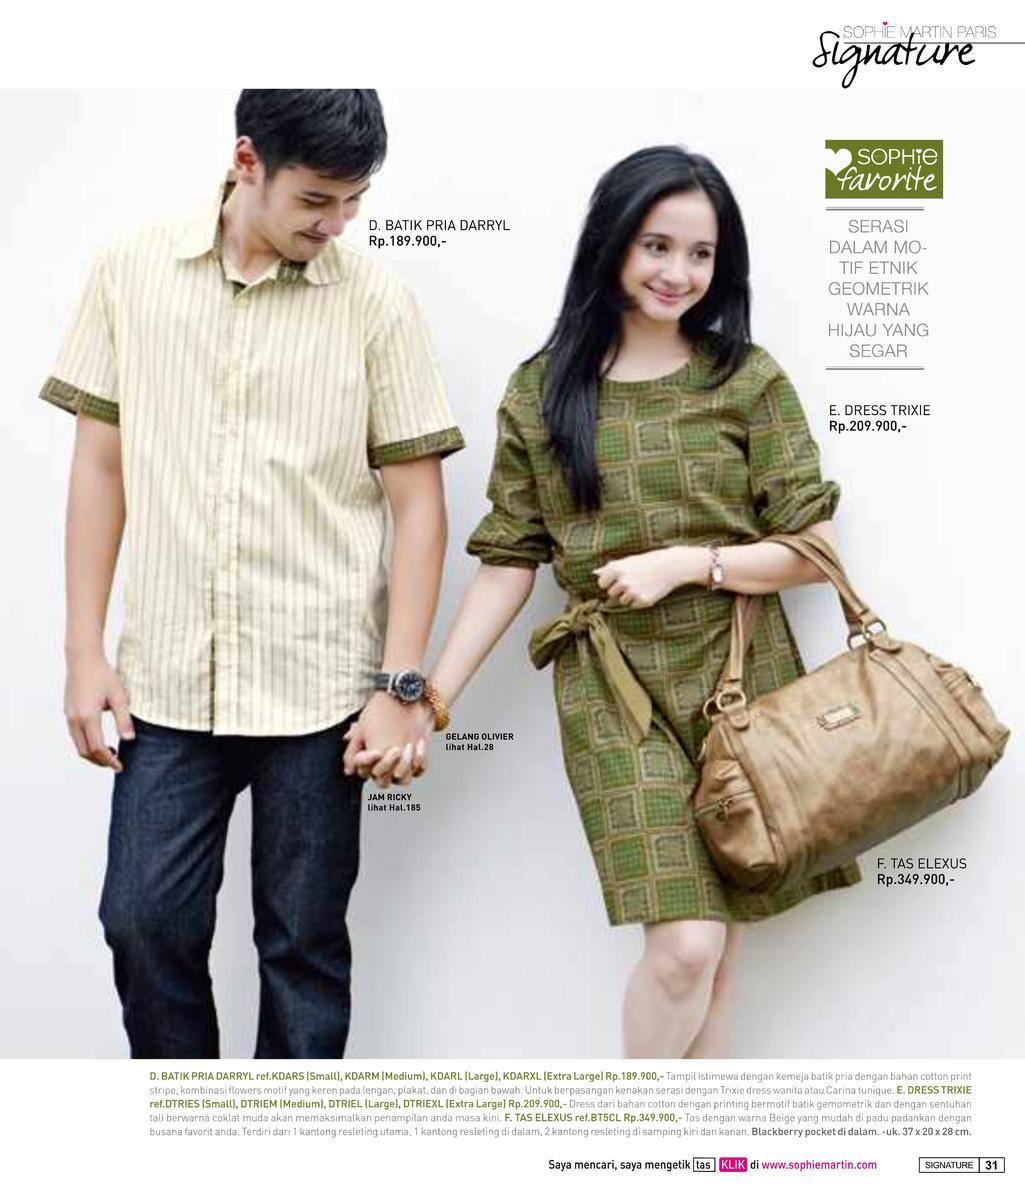 Webe models farah baju wanita pakaian terbaru trend fashion 2011 cara